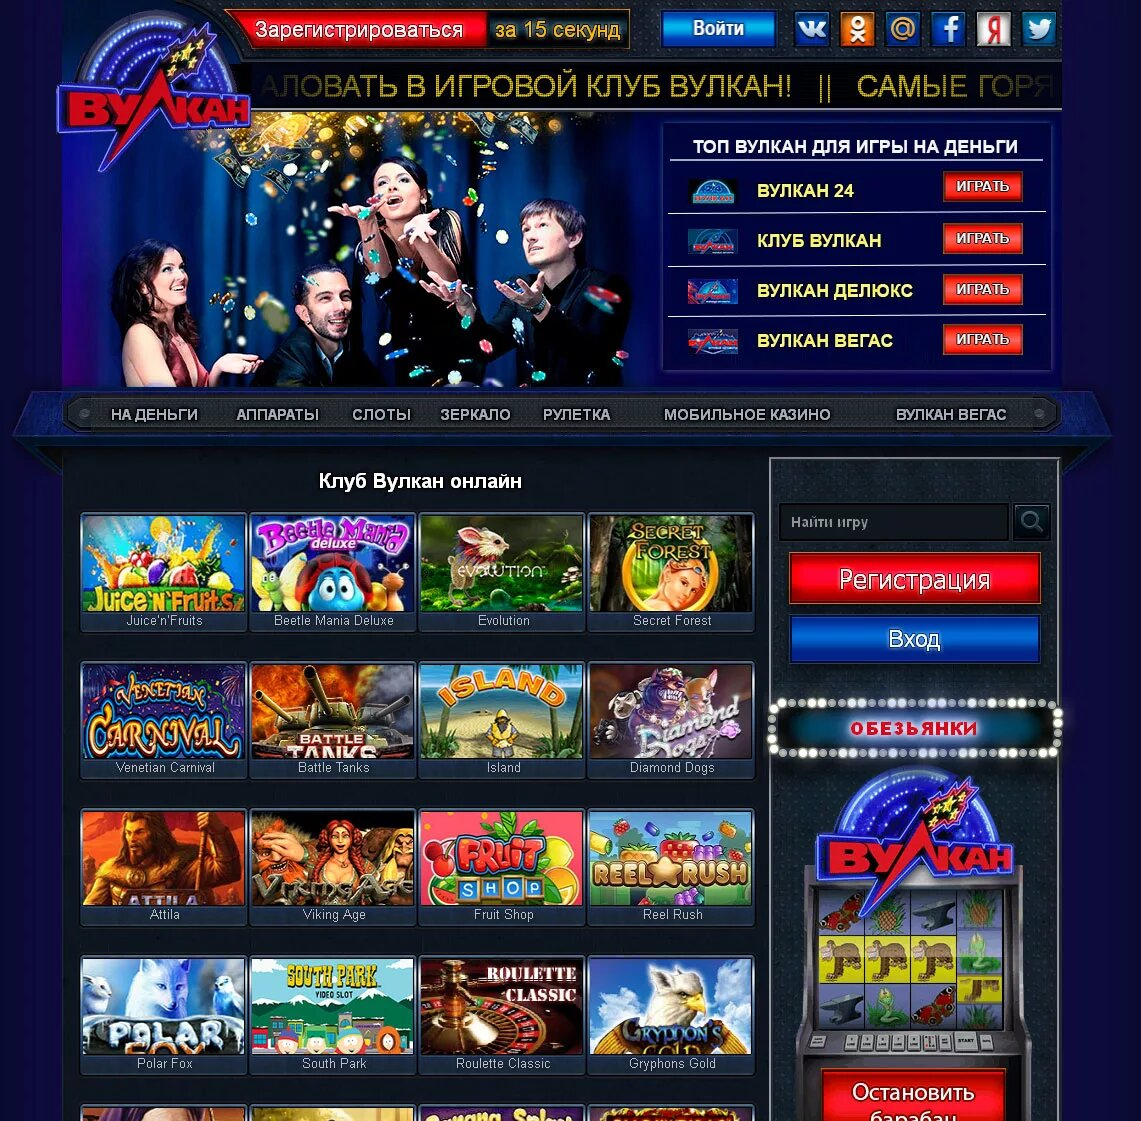 сайт best casinoz info обзор вулкан 24